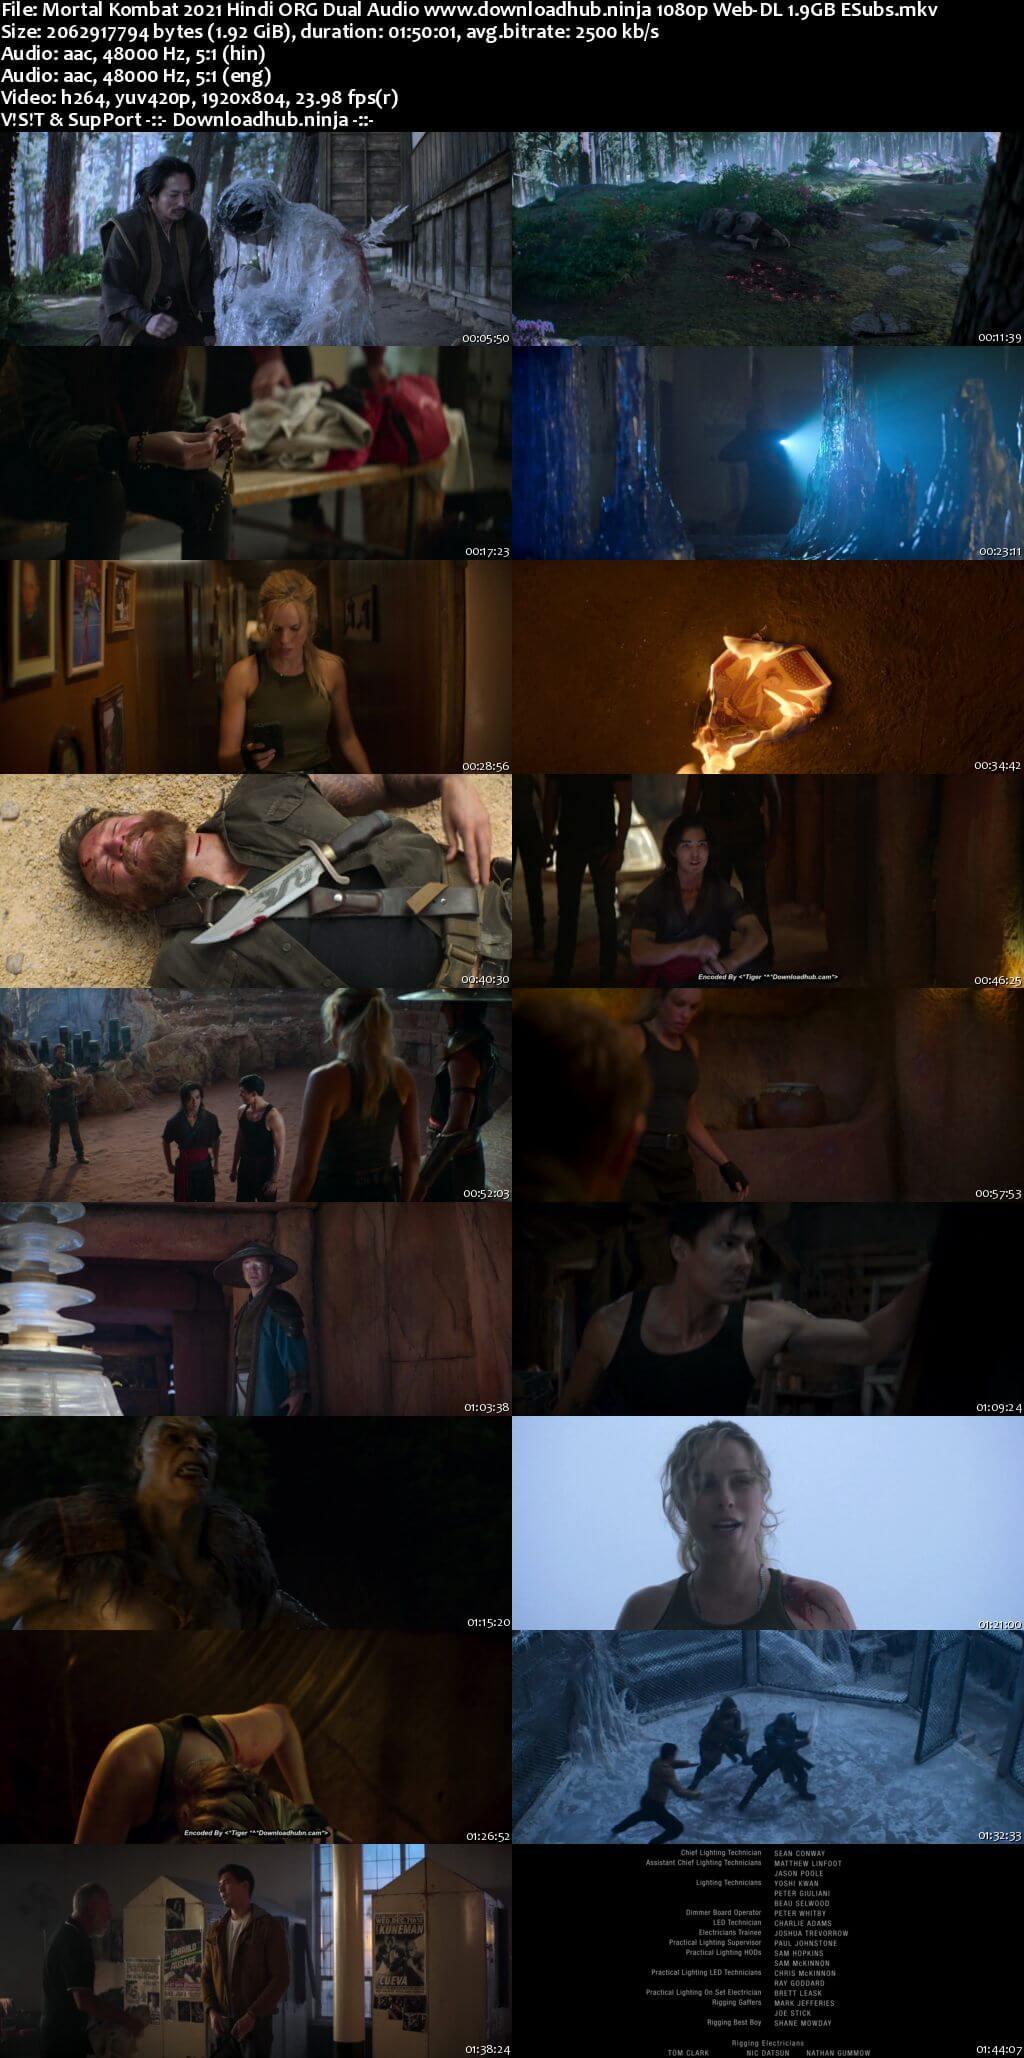 Mortal Kombat 2021 Hindi ORG Dual Audio 1080p Web-DL 1.9GB ESubs